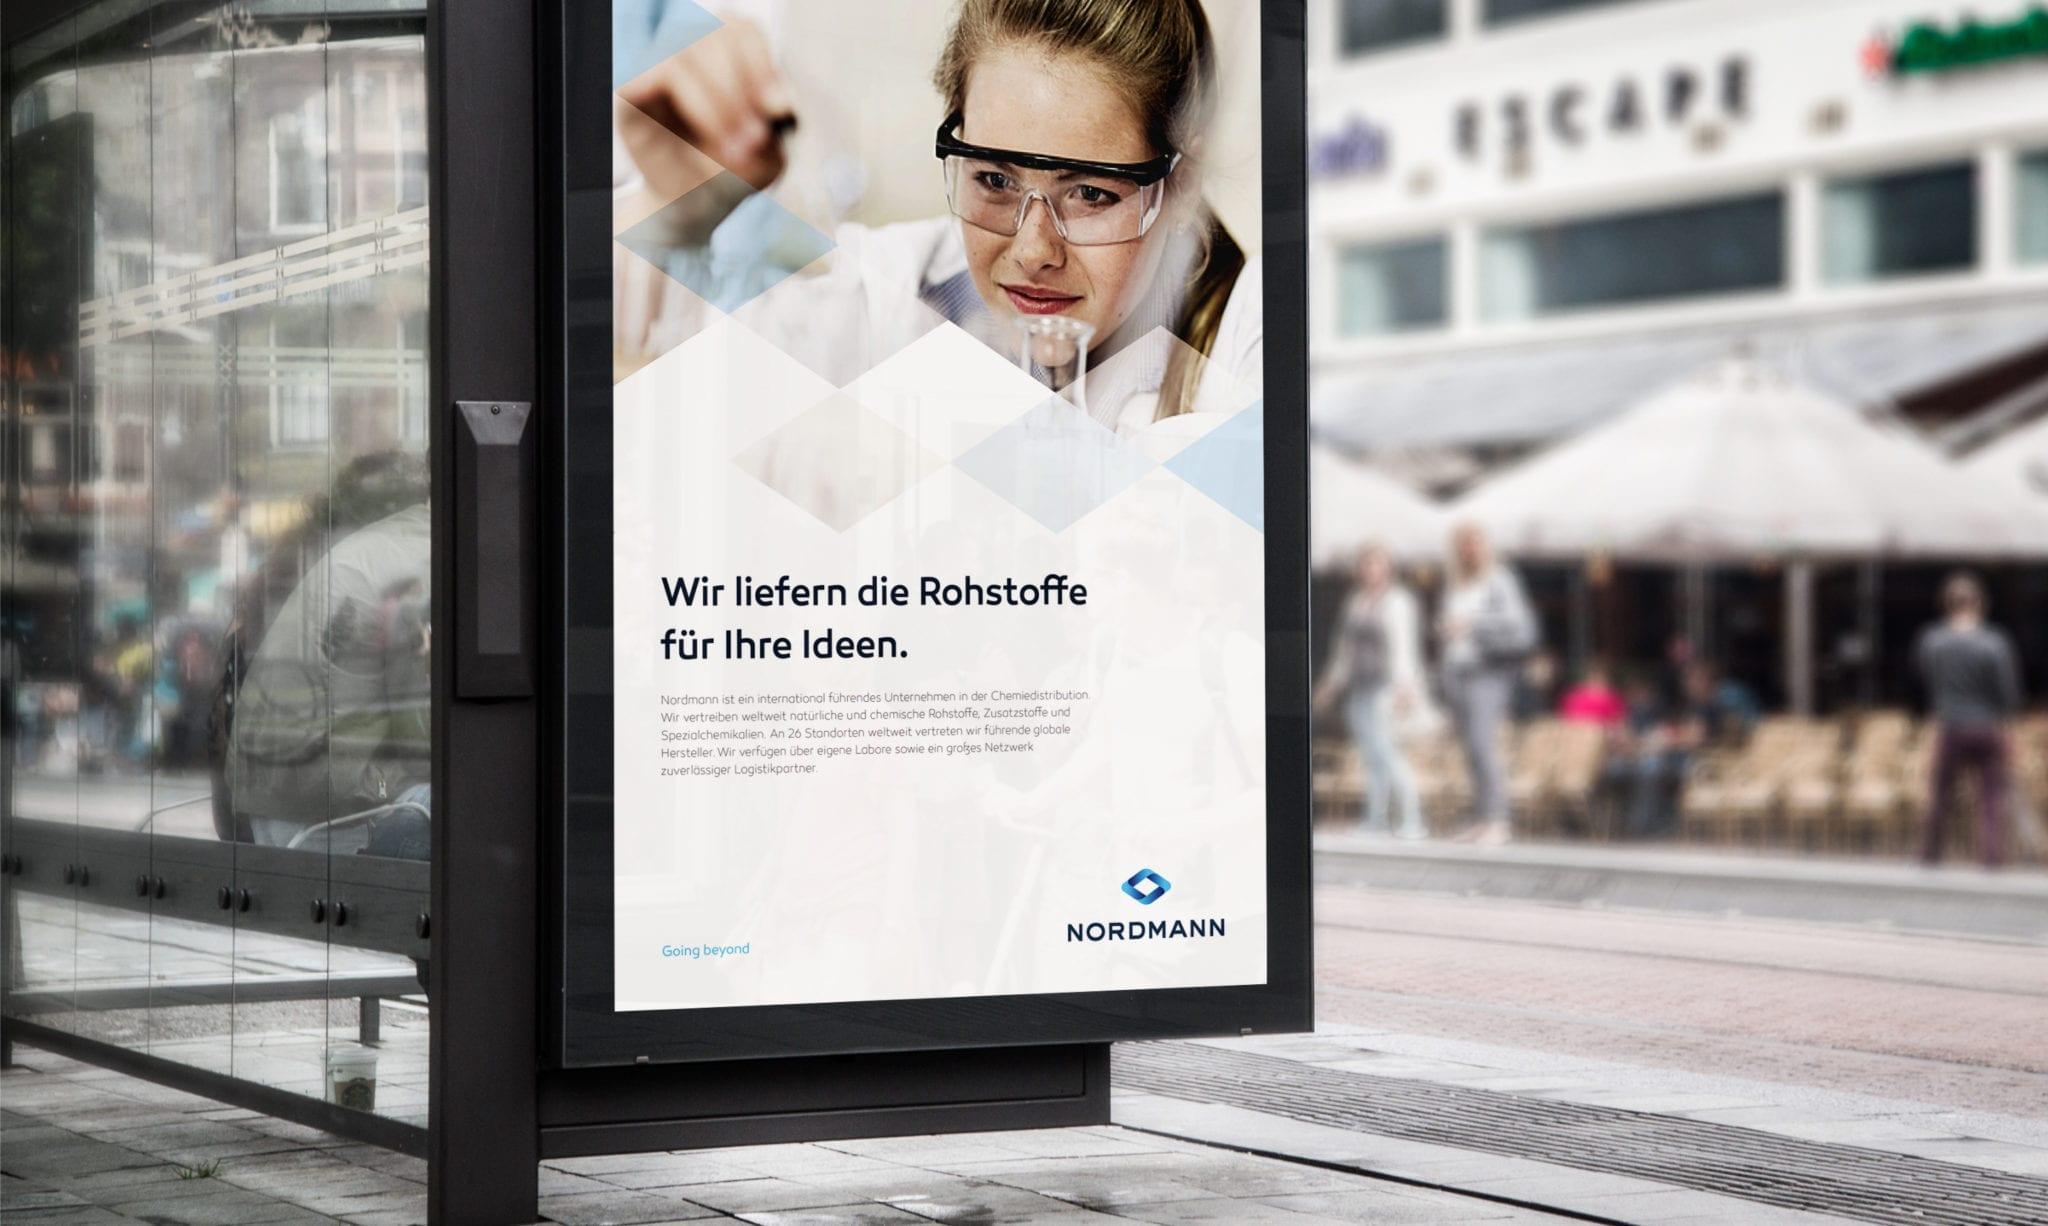 Nordmann poster at bus stop